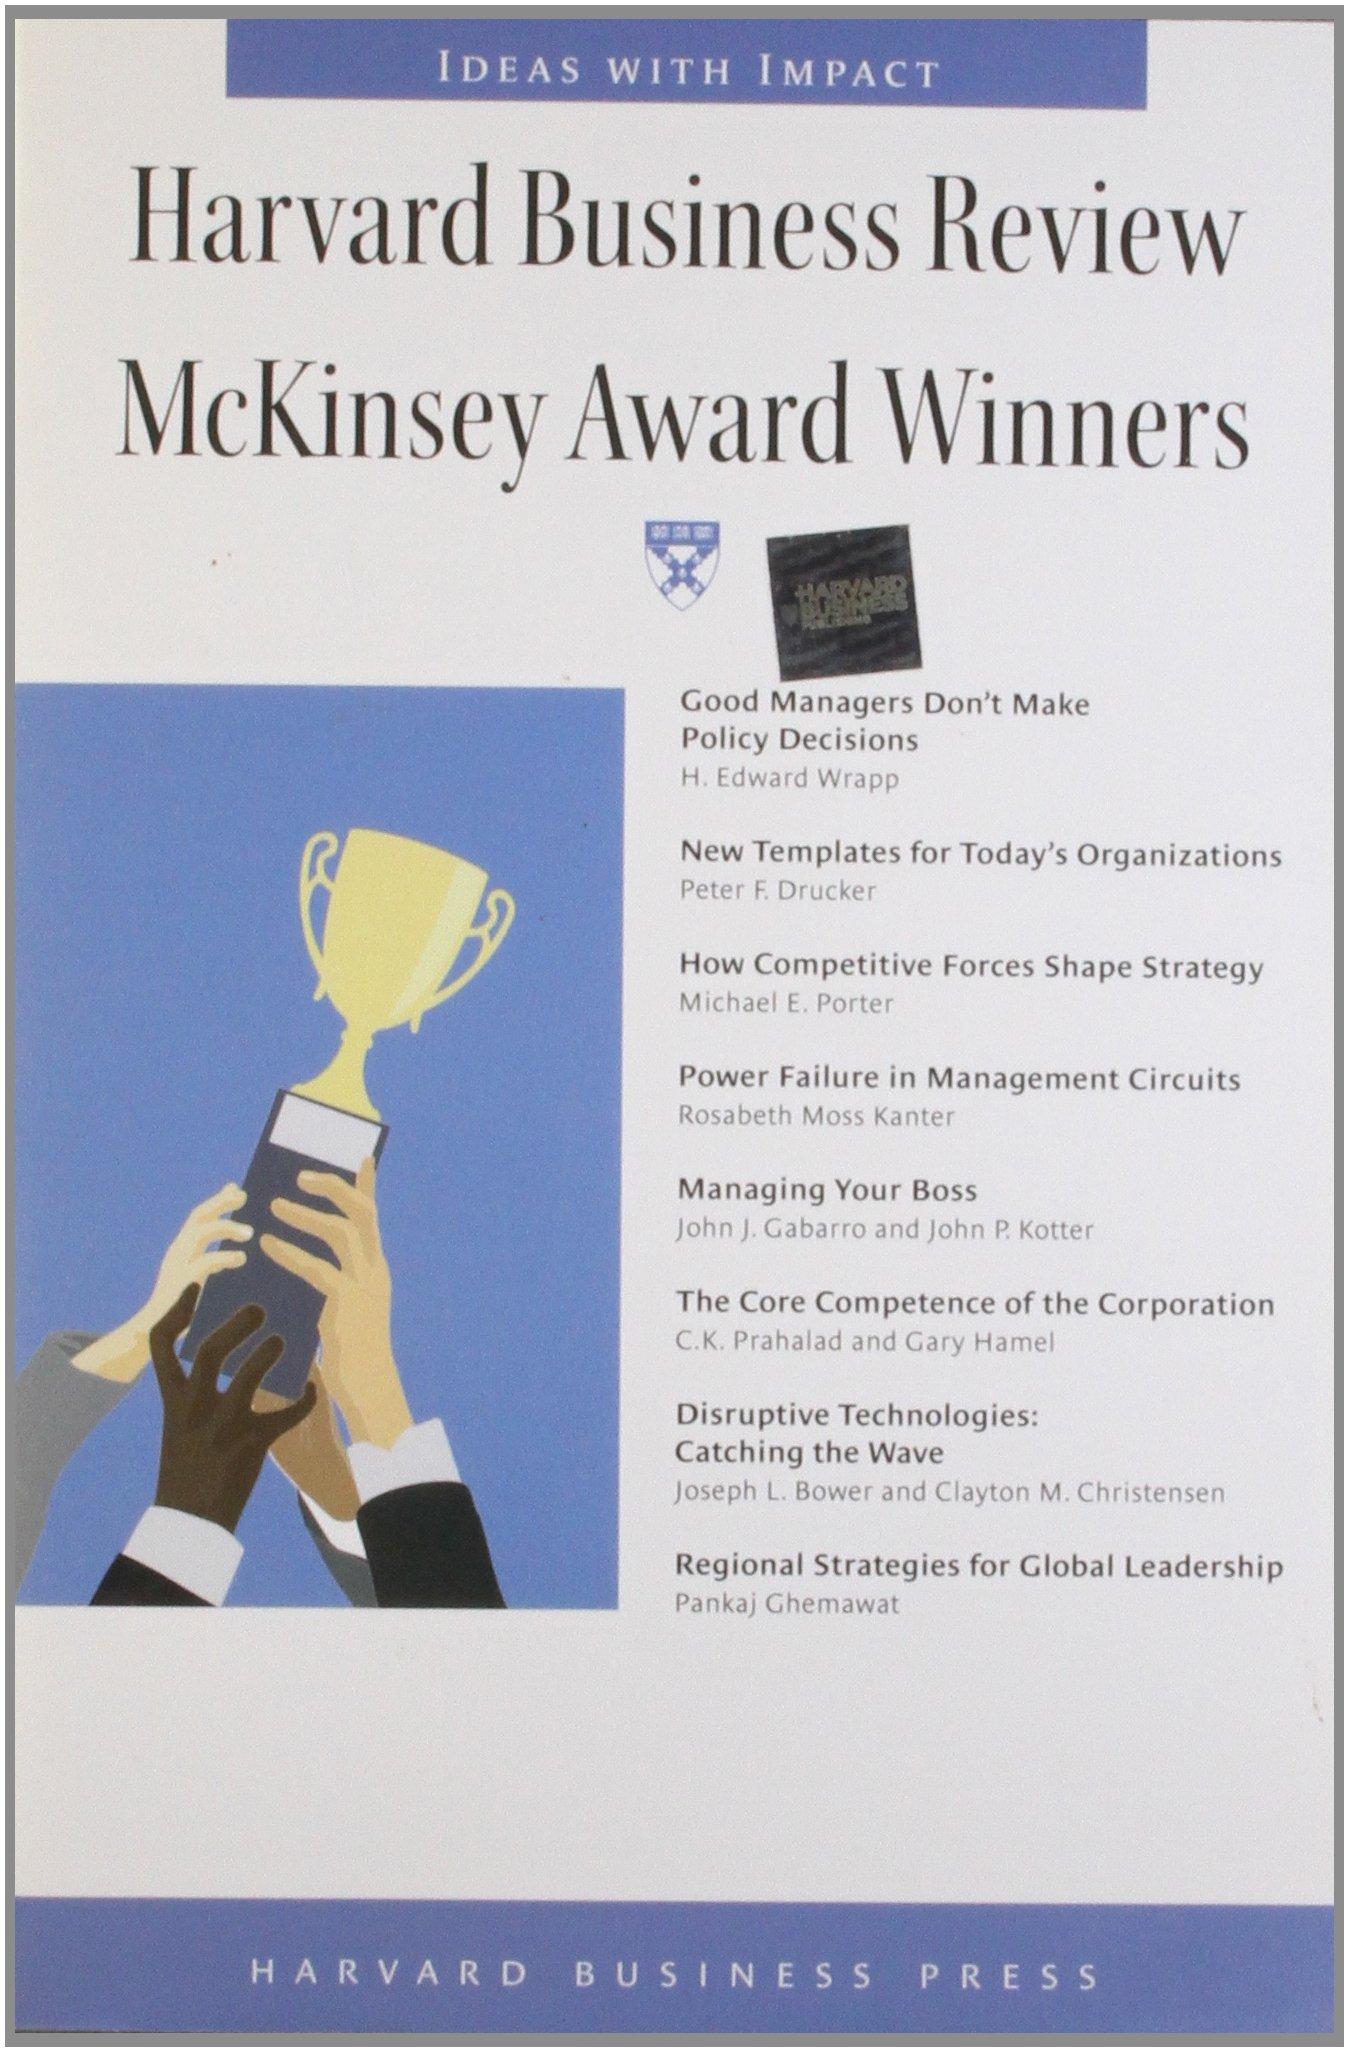 Harvard Business Review McKinsey Award Winners (Harvard Business Review Paperback Series) ebook